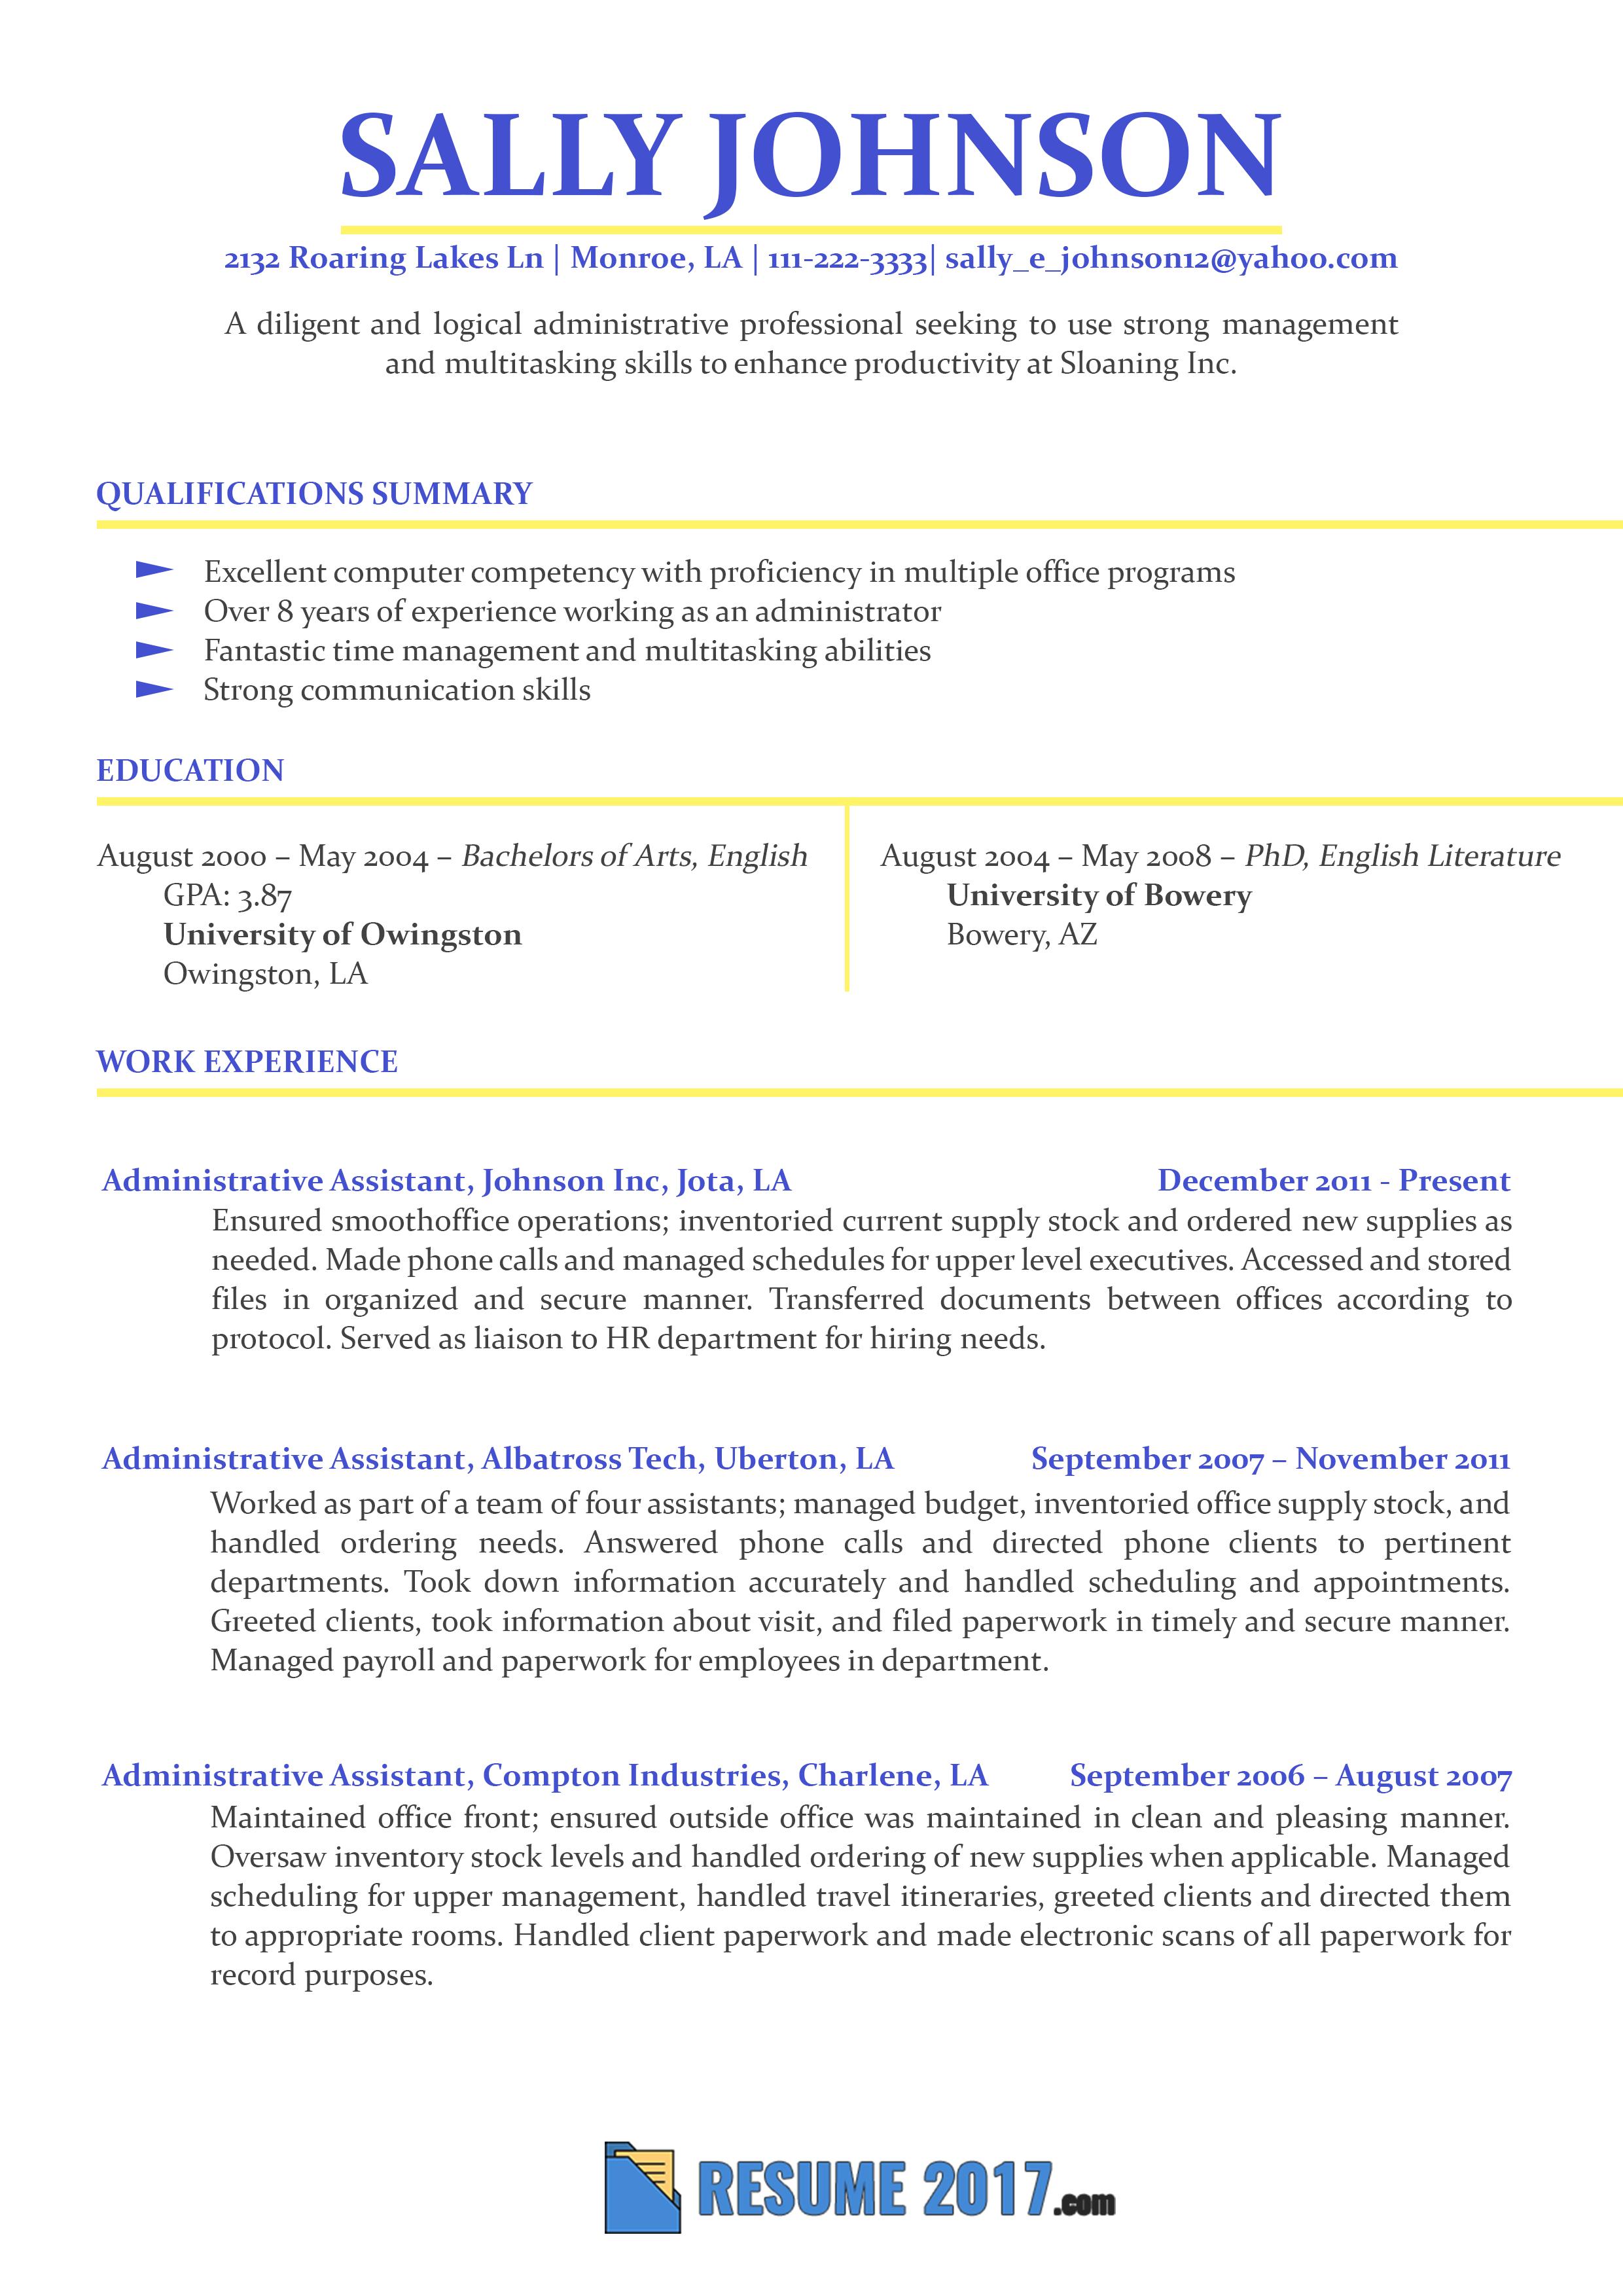 Resume Format 2018 2 Resume Format Resume Examples Resume